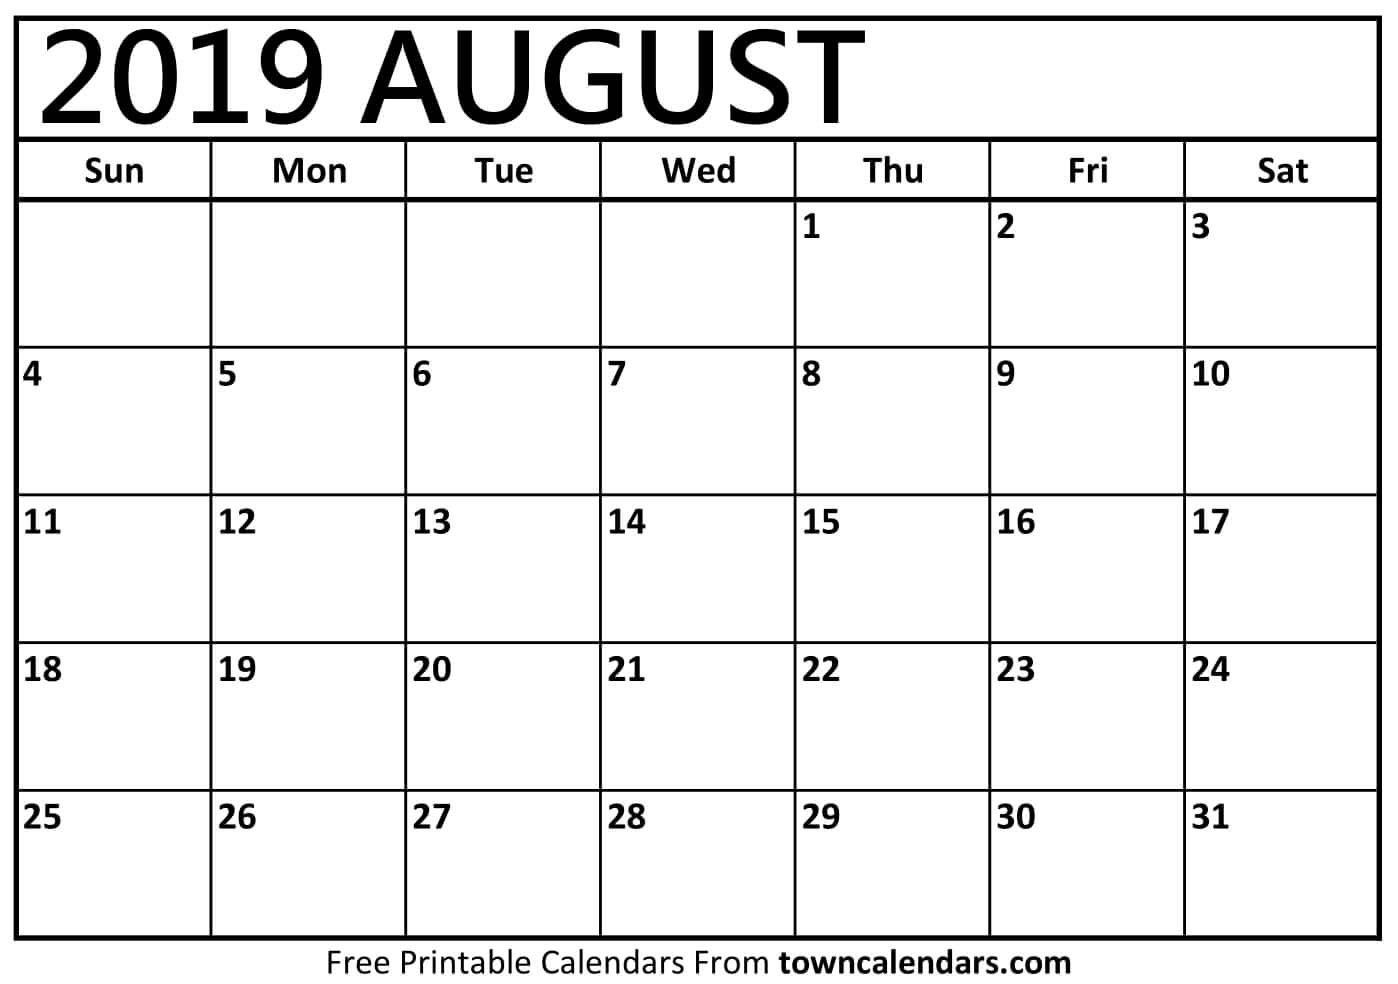 Printable August 2019 Calendar - Towncalendars August 3 2019 Calendar